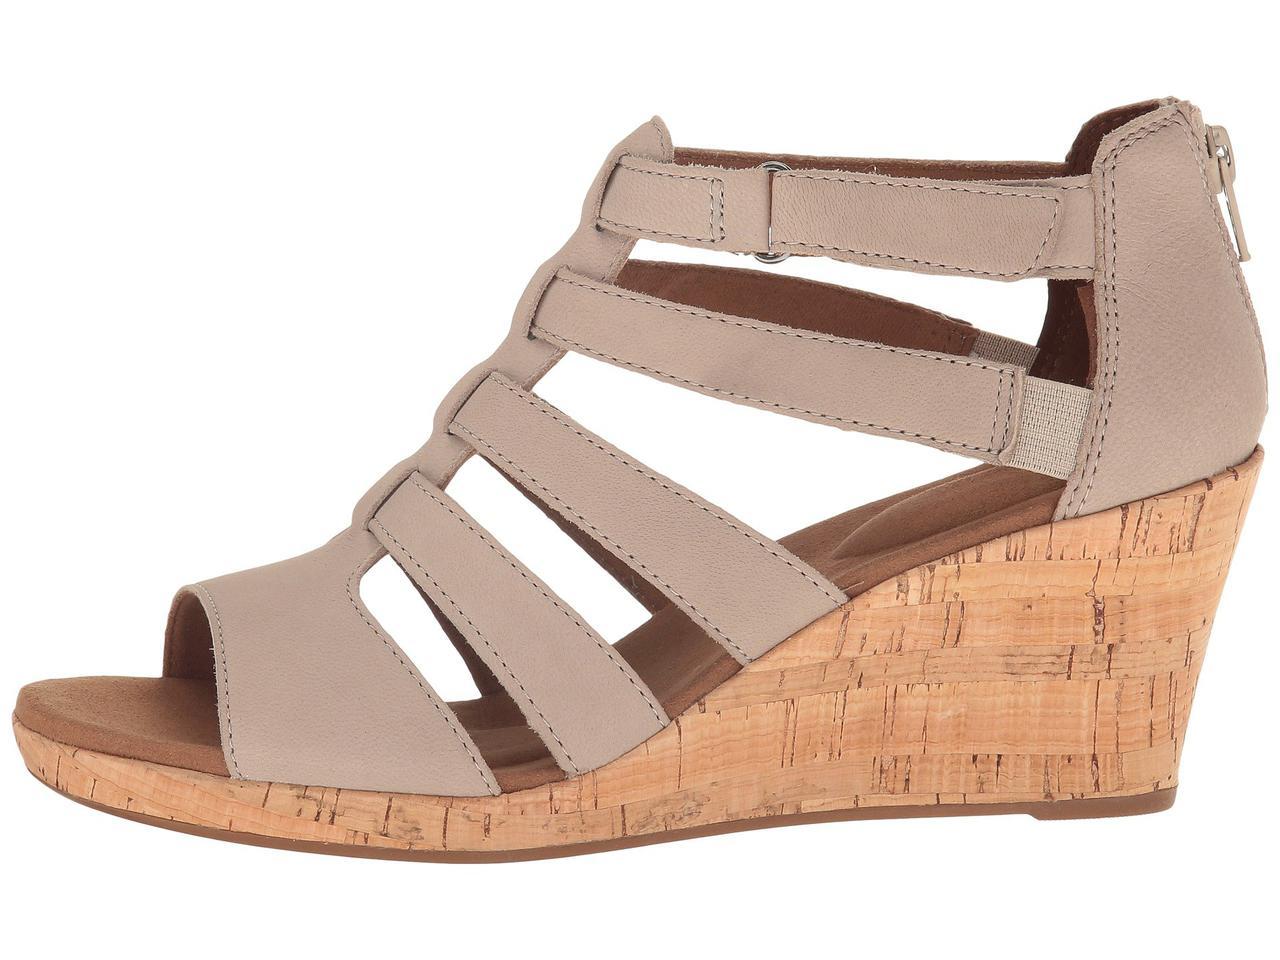 e70ee6da8d88 ... Туфли на каблуке (Оригинал) Rockport Briah Gladiator New Taupe Nubuck